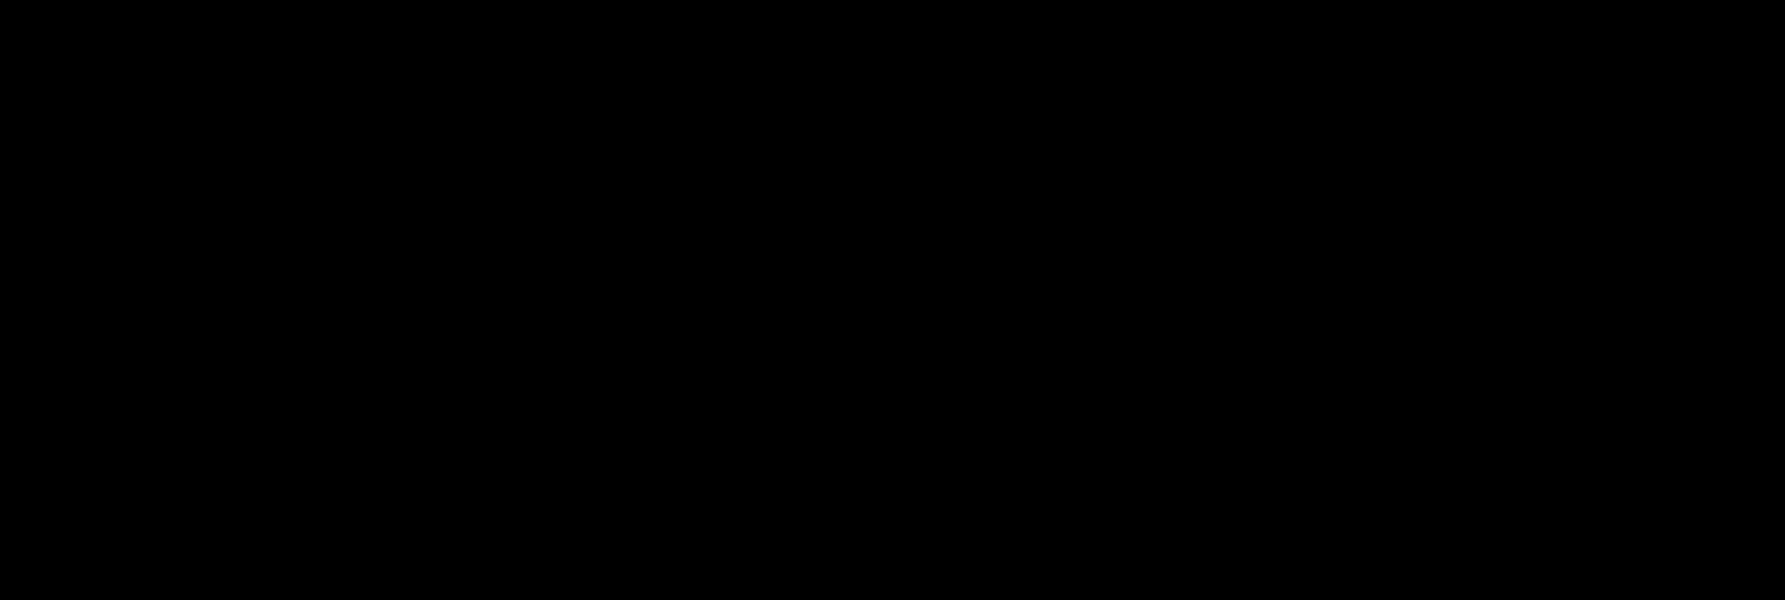 Swile logo